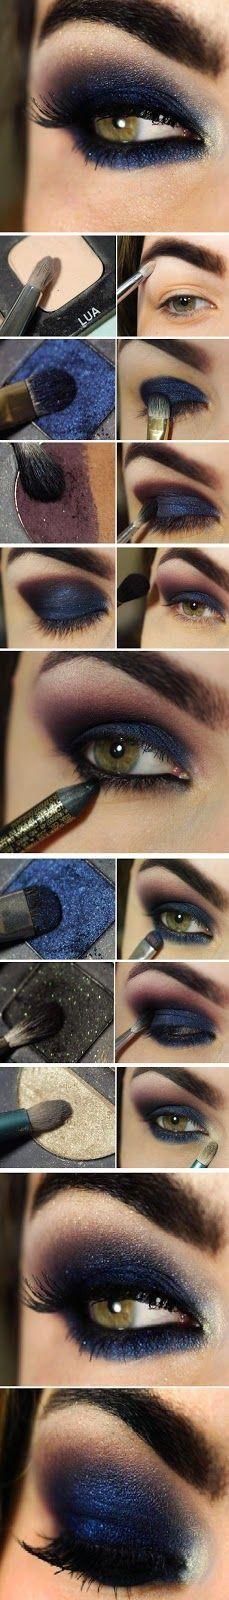 Fantastic Makeup Tips for Formal Cocktails #party #formal #women #covetme